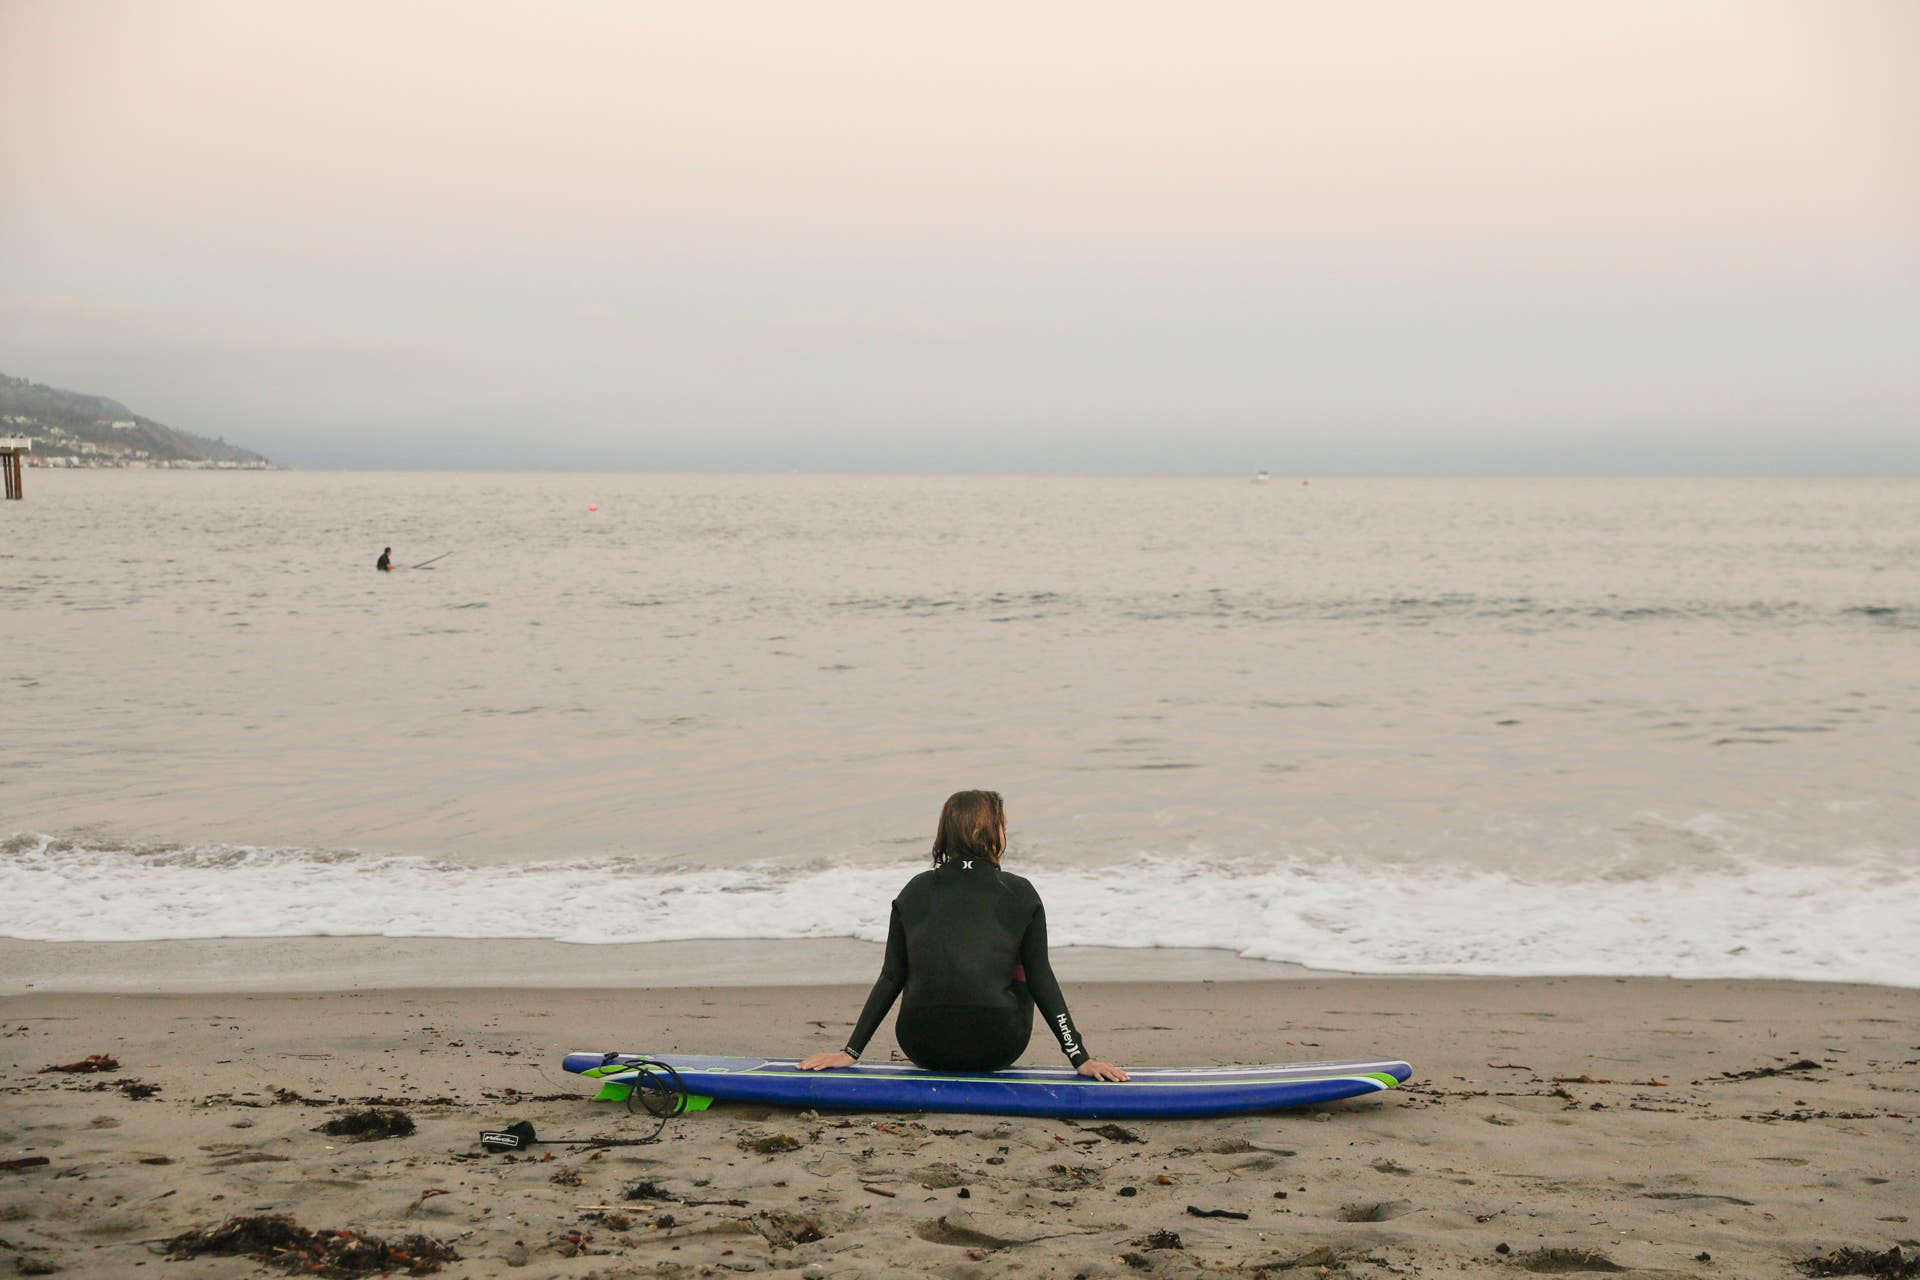 Malibu Surfrider Beach      Photo: Yuri Hasegawa